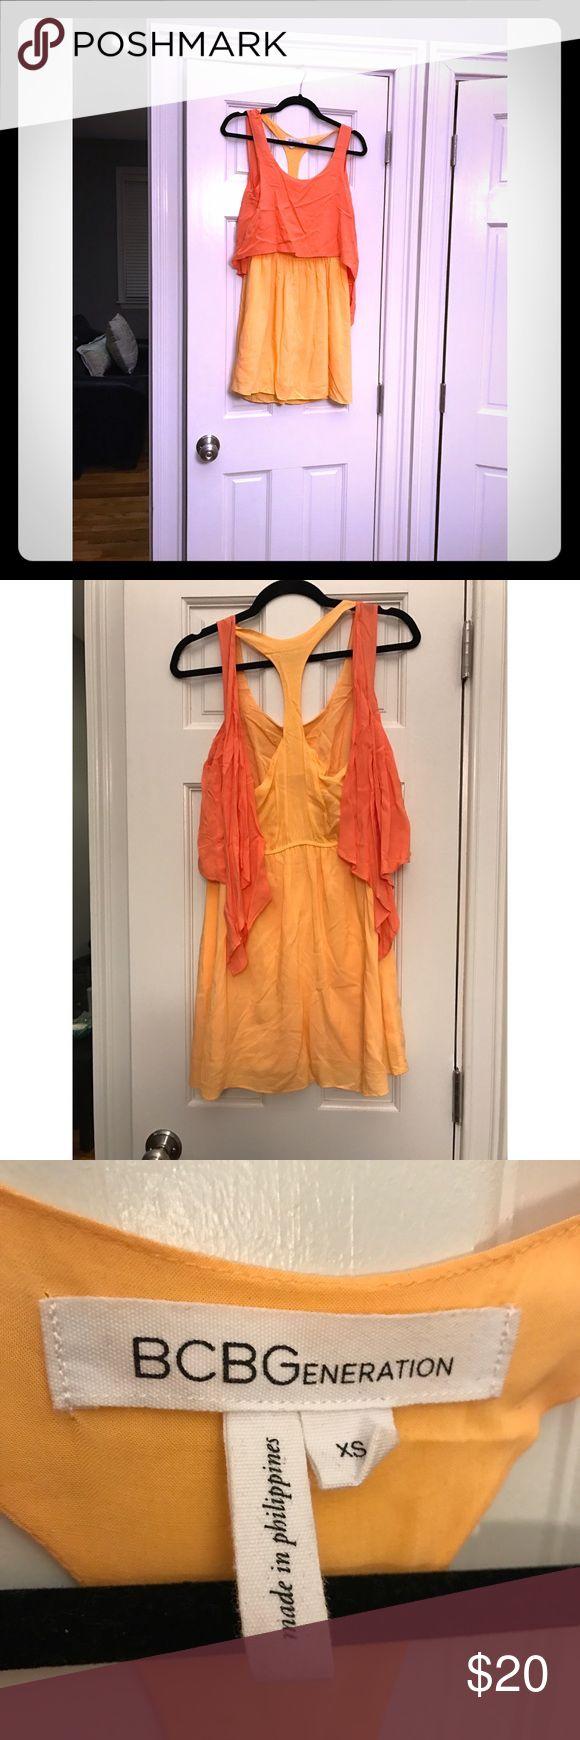 BCBGeneration Tangerine Dress - XS BCBGeneration Tangerine Dress - XS - Breezy and comfortable.. great color! BCBGeneration Dresses